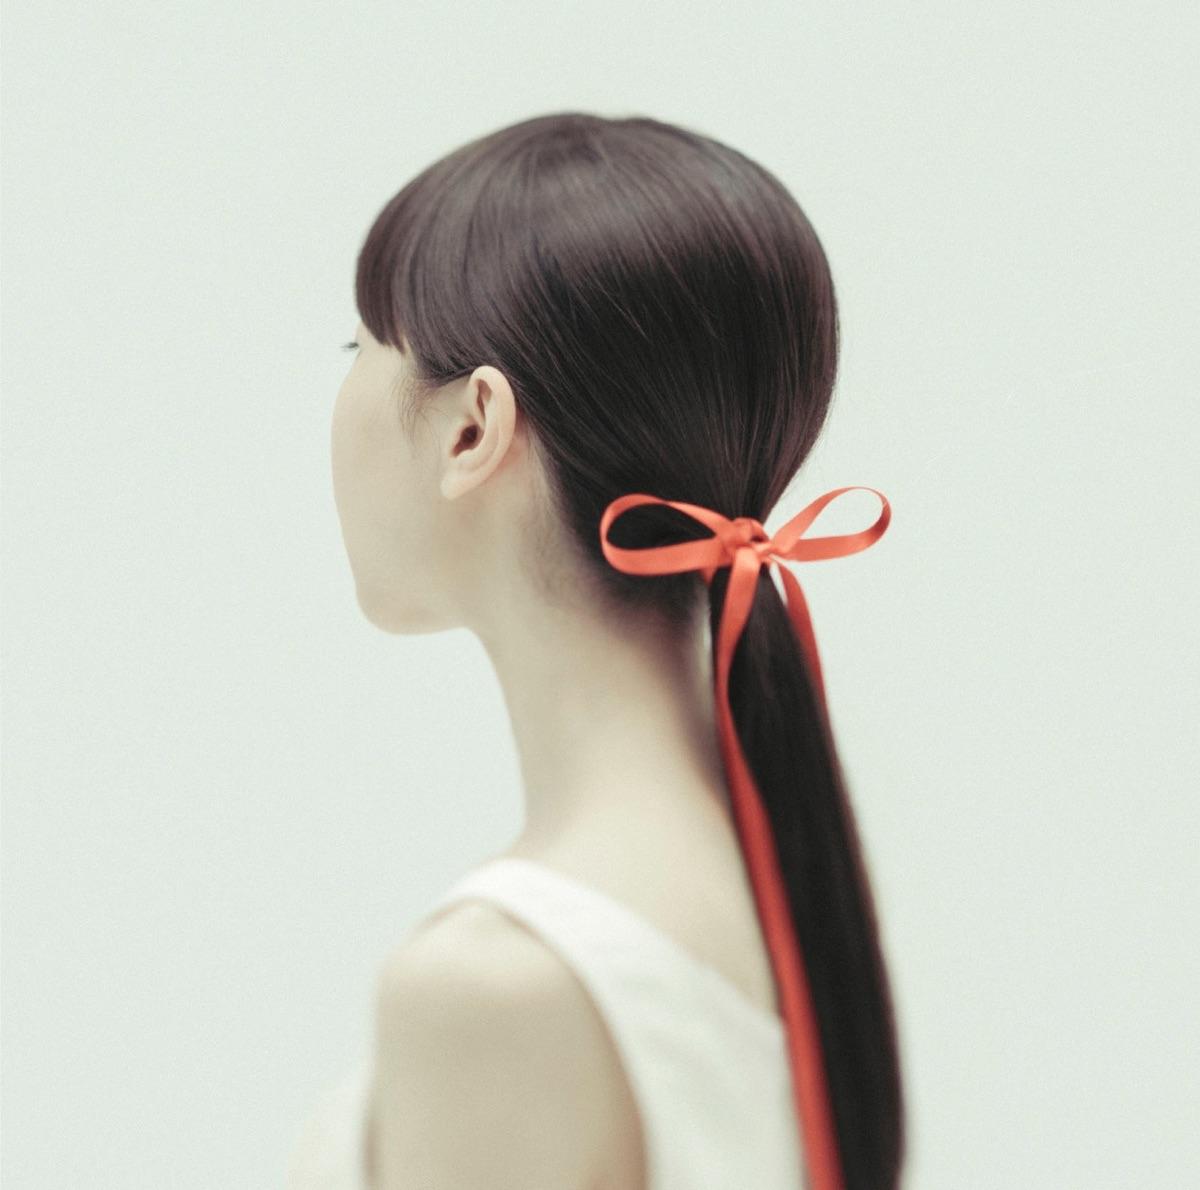 『Aimer - 蝶々結び』収録の『蝶々結び』ジャケット